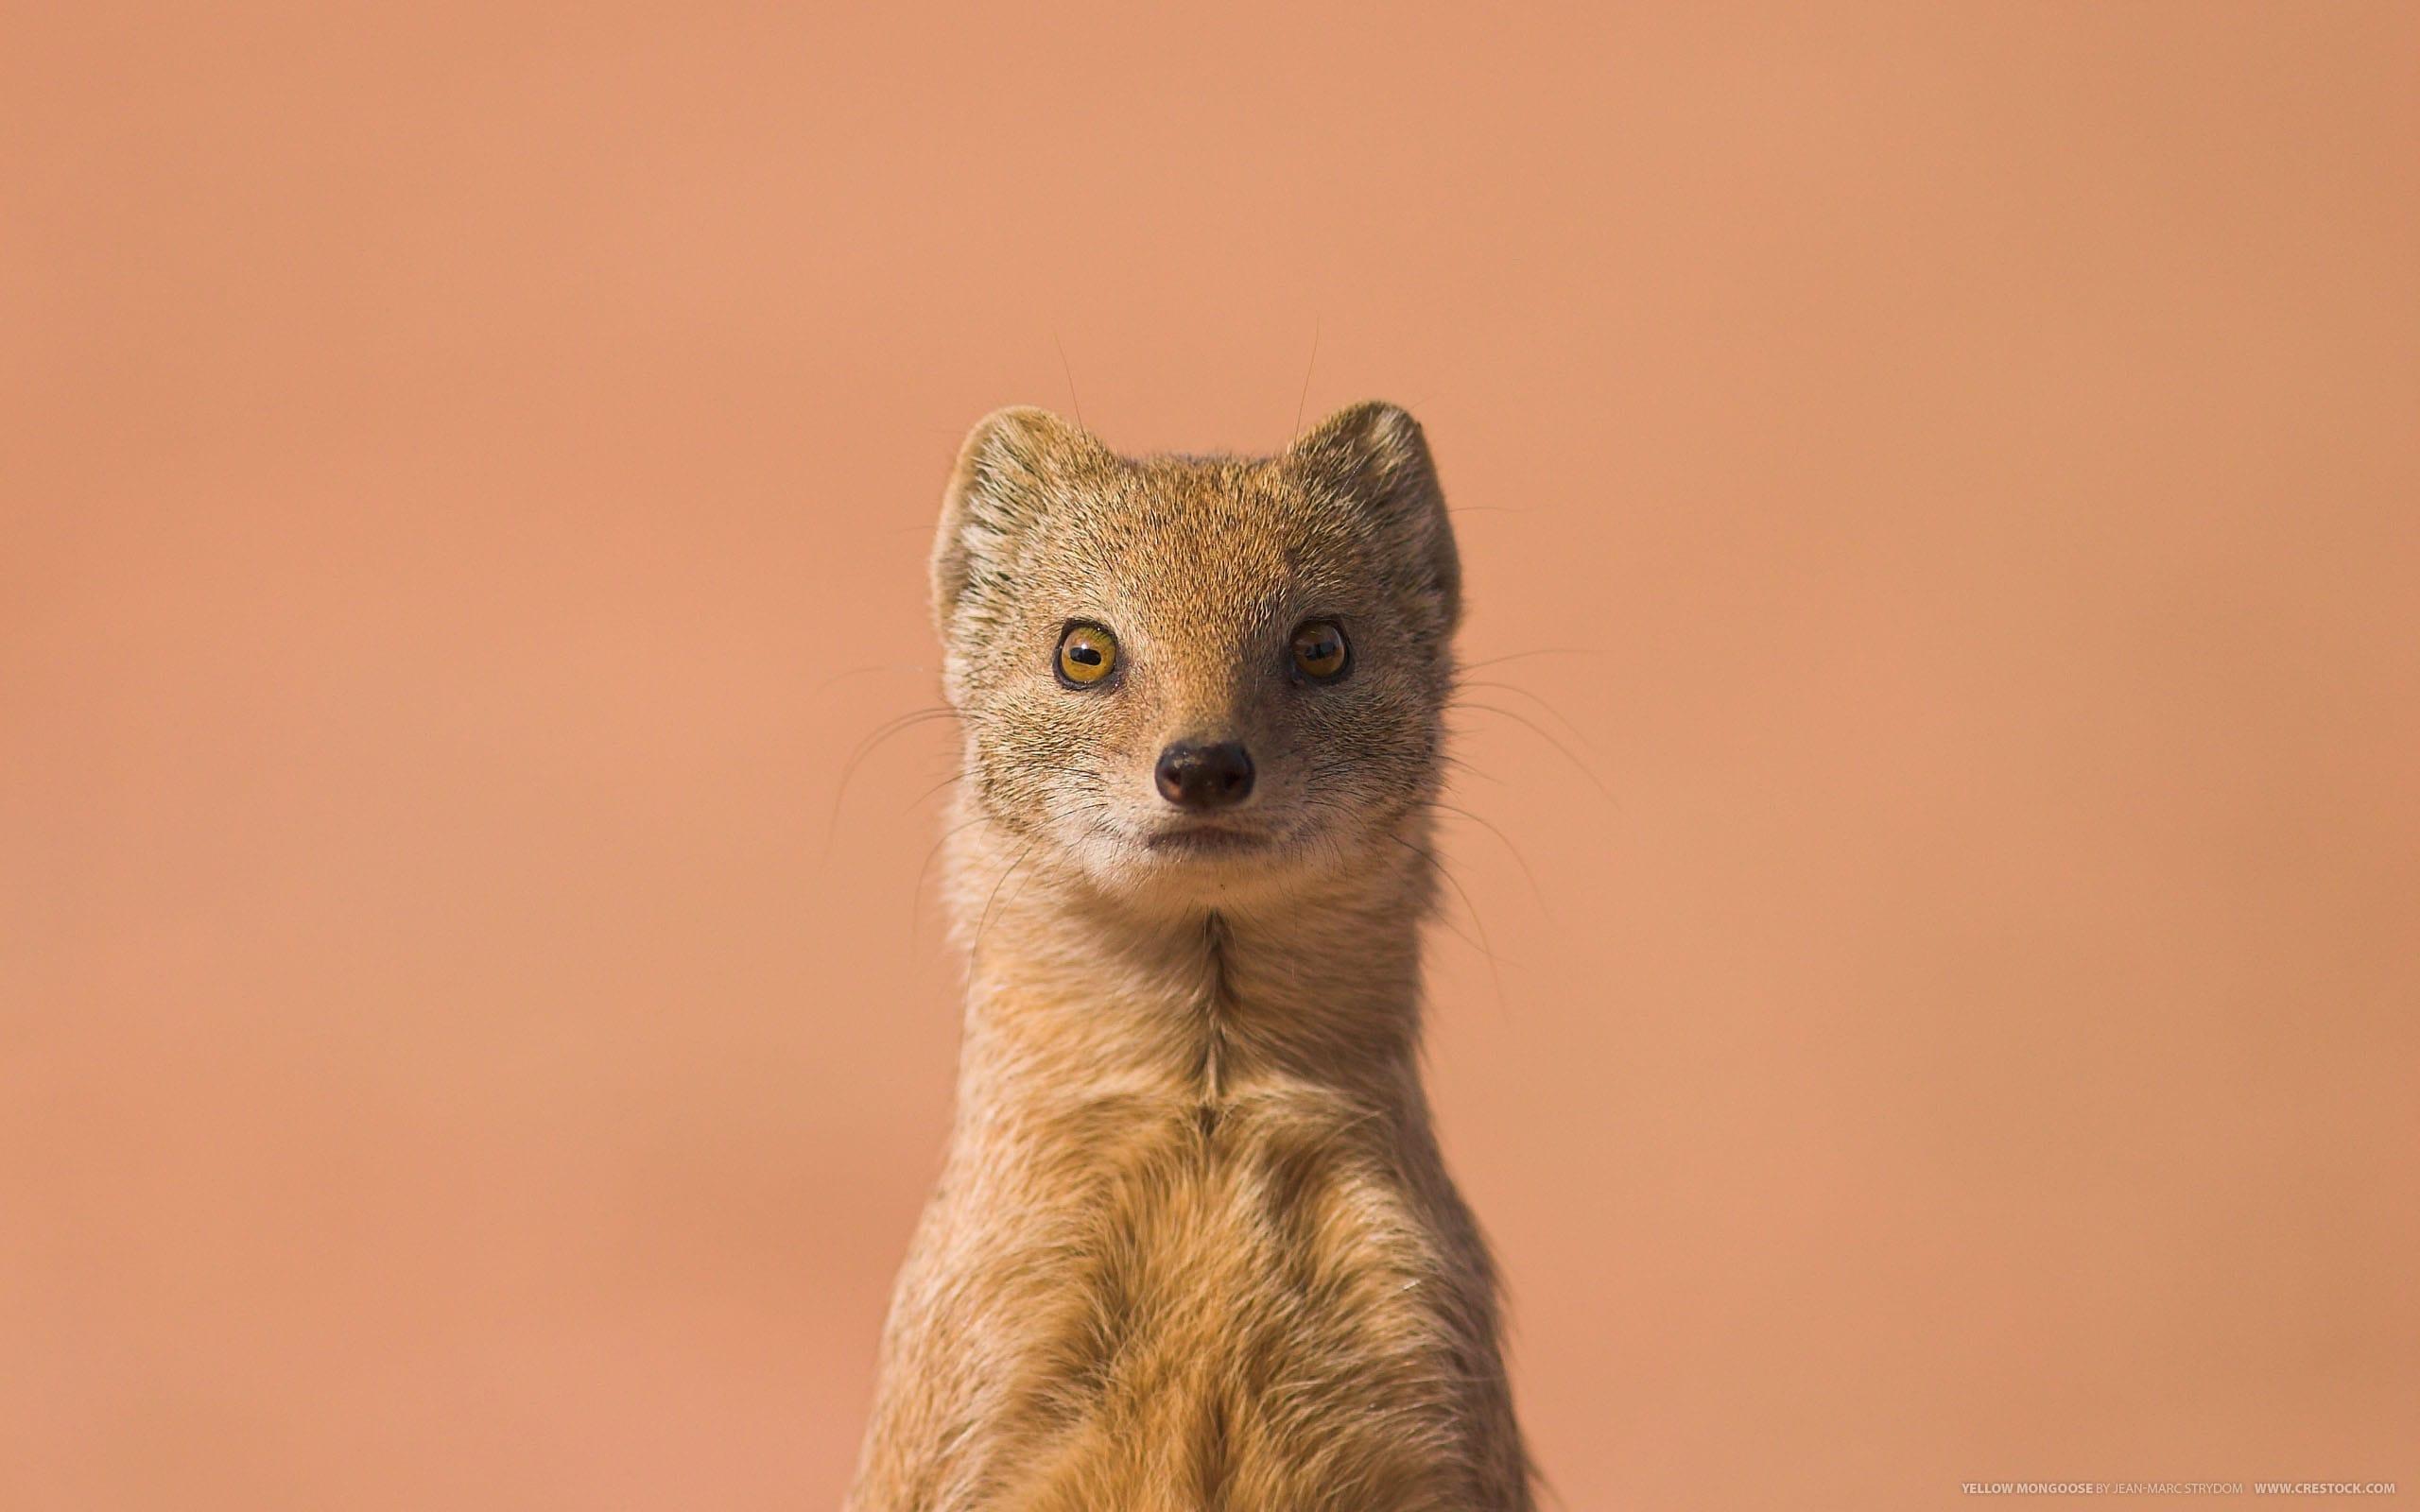 Mongoose widescreen wallpapers